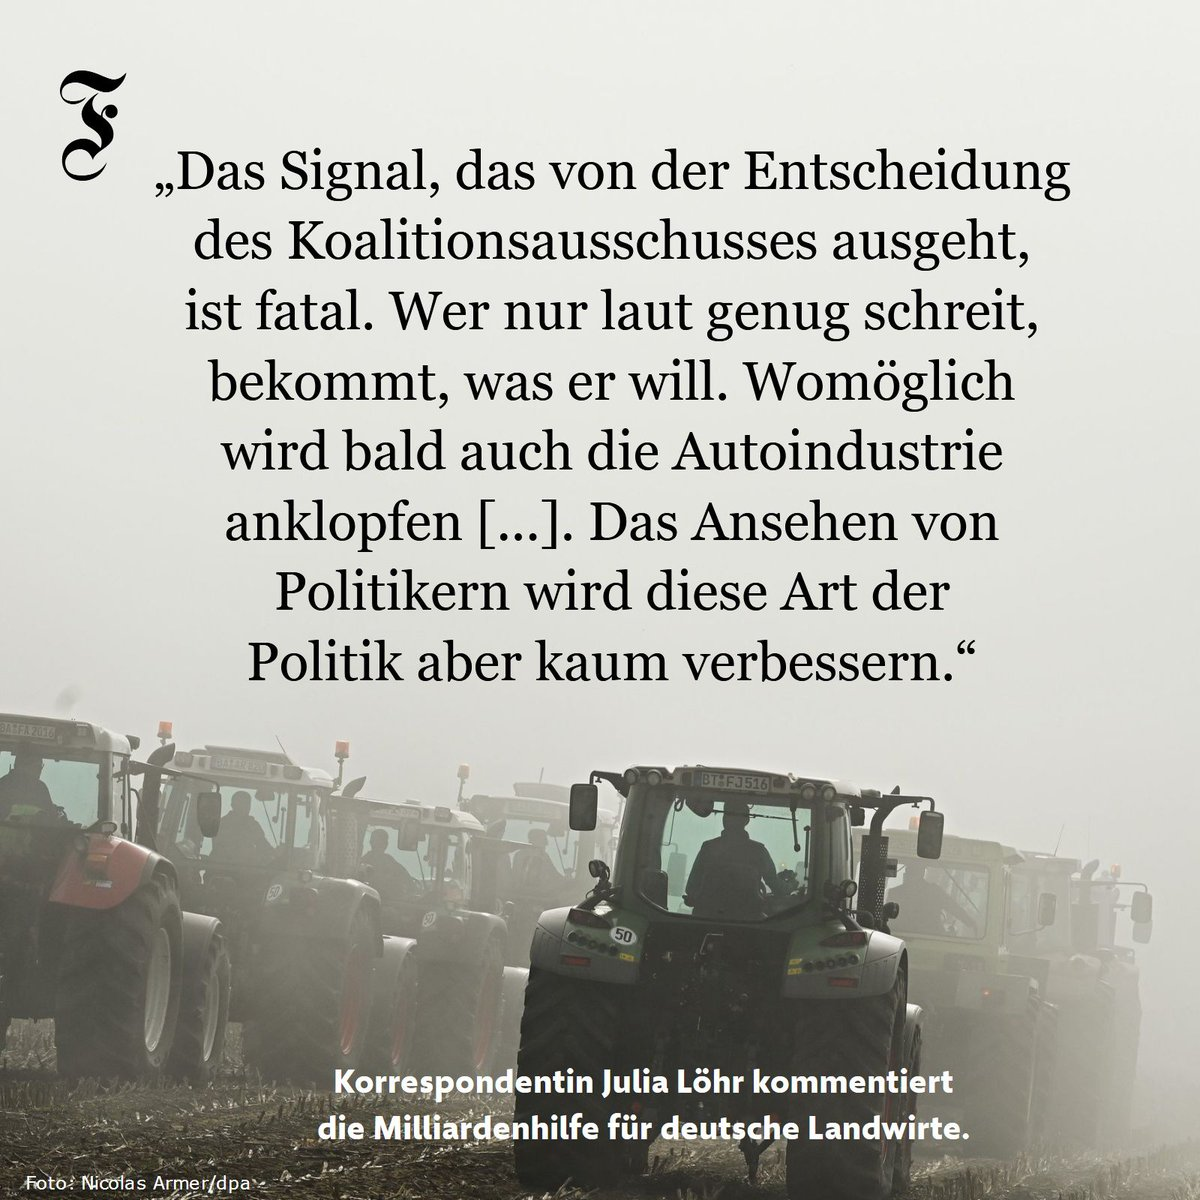 #Bauernmilliarde